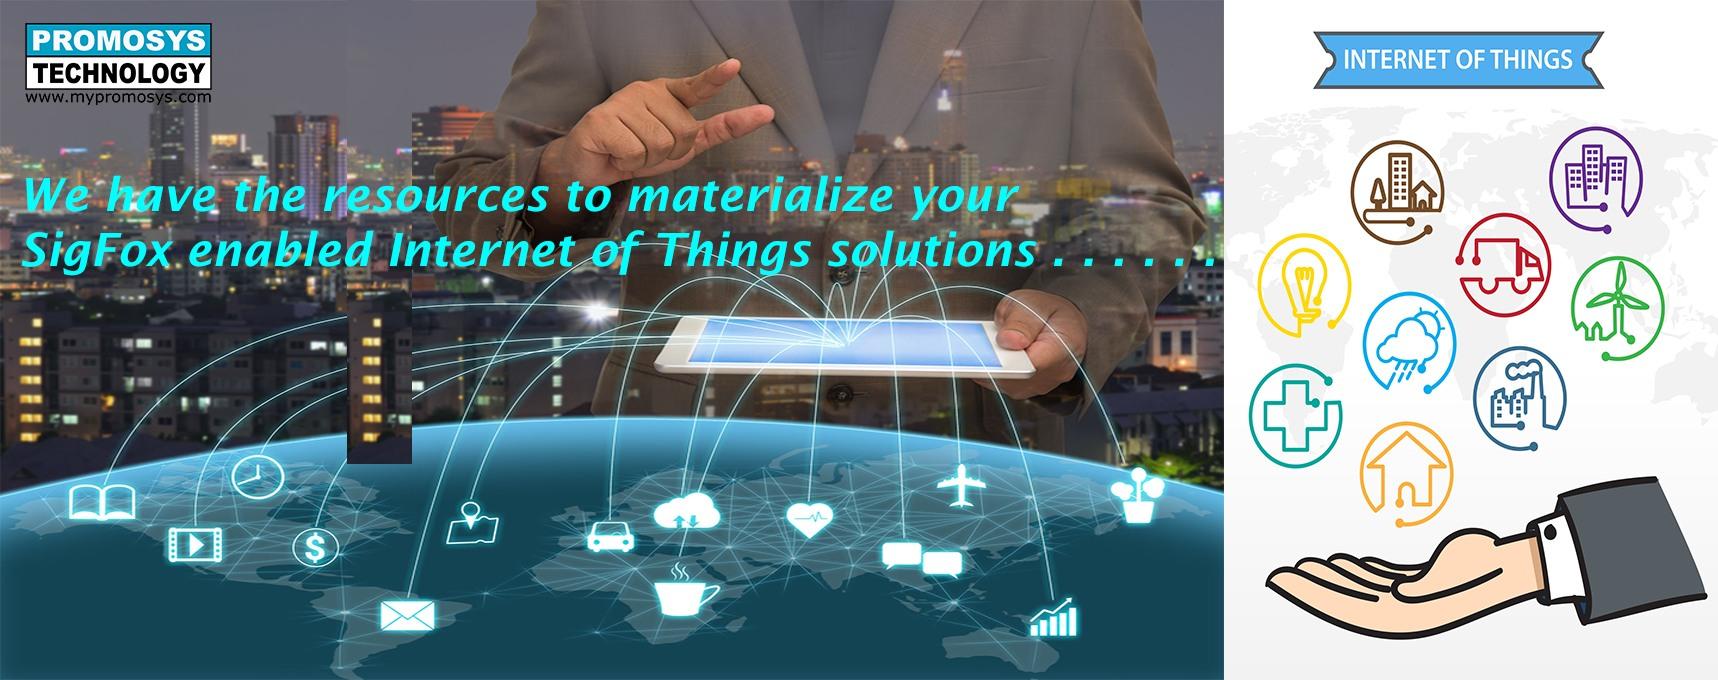 Promosys Technology M Sdn Bhd Sigfox Partner Network The Iot